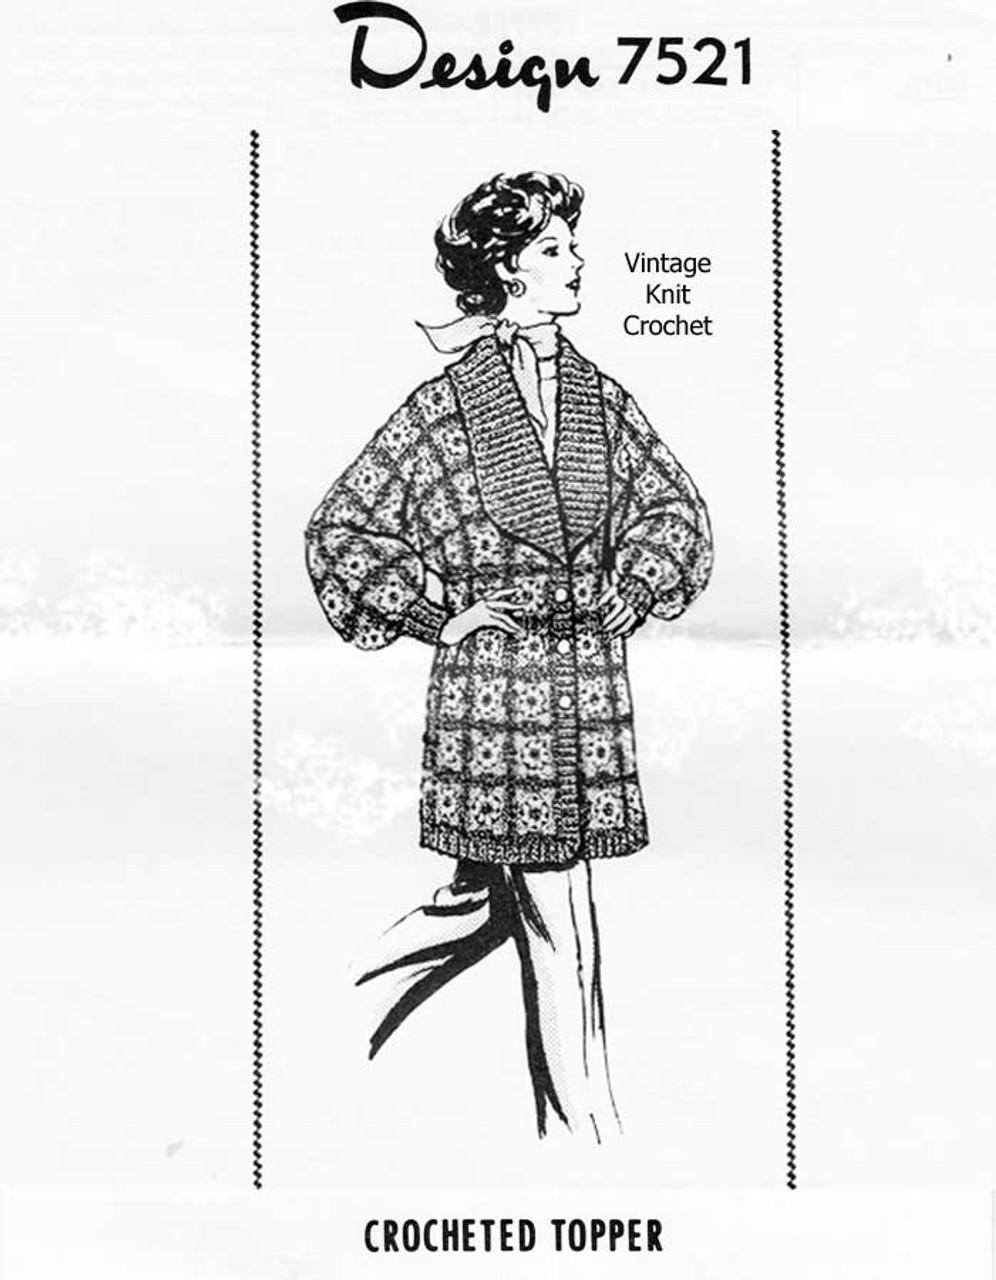 Granny Square Crochet Coat Pattern Design 7521